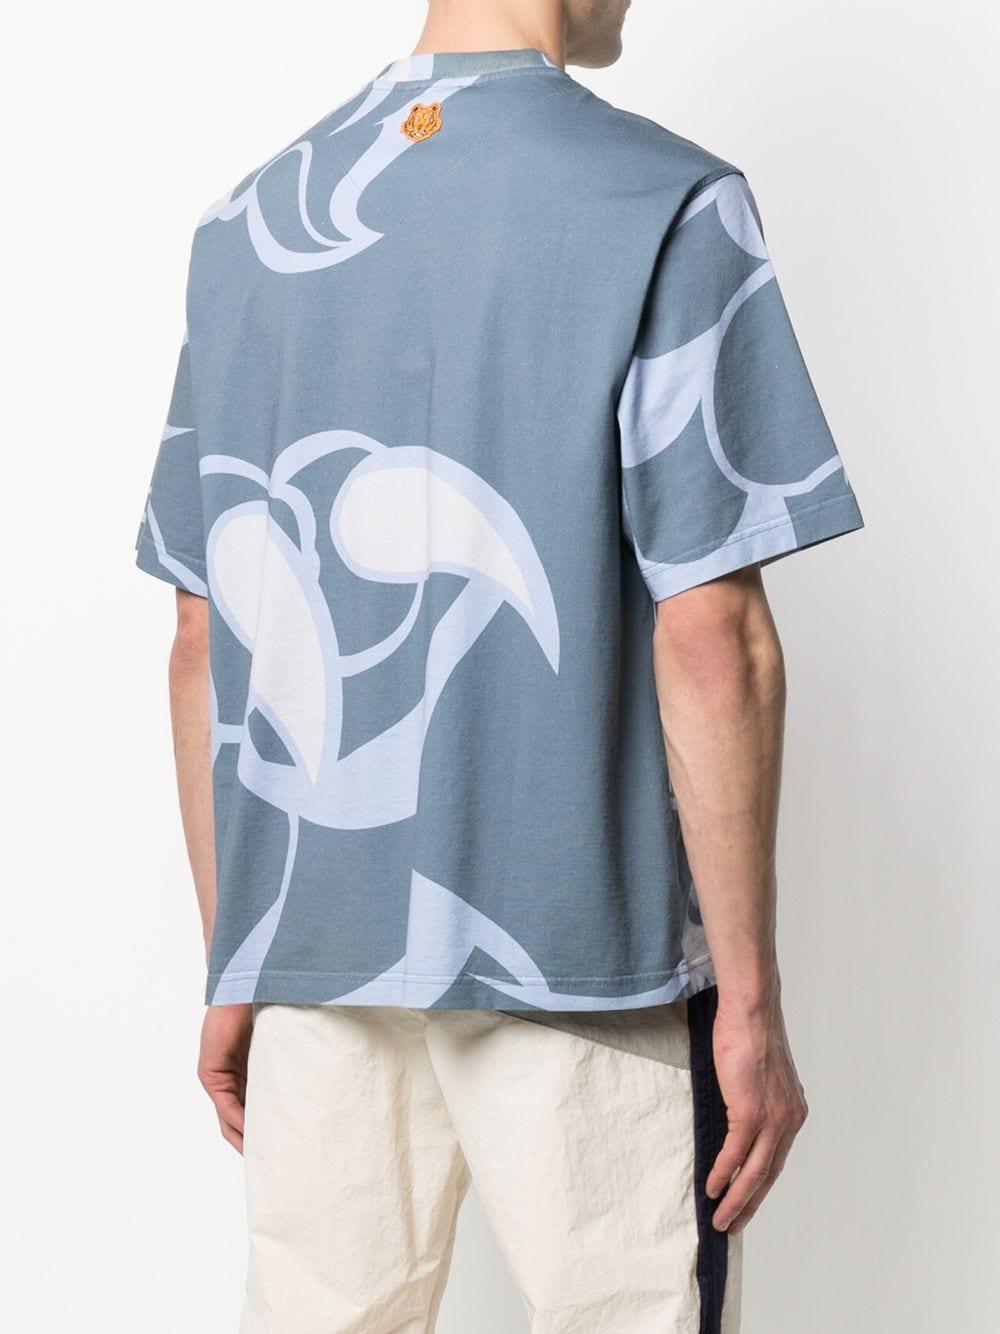 Kenzo t-shirt con stampa uomo KENZO | T-shirt | FB55TS0734SK67